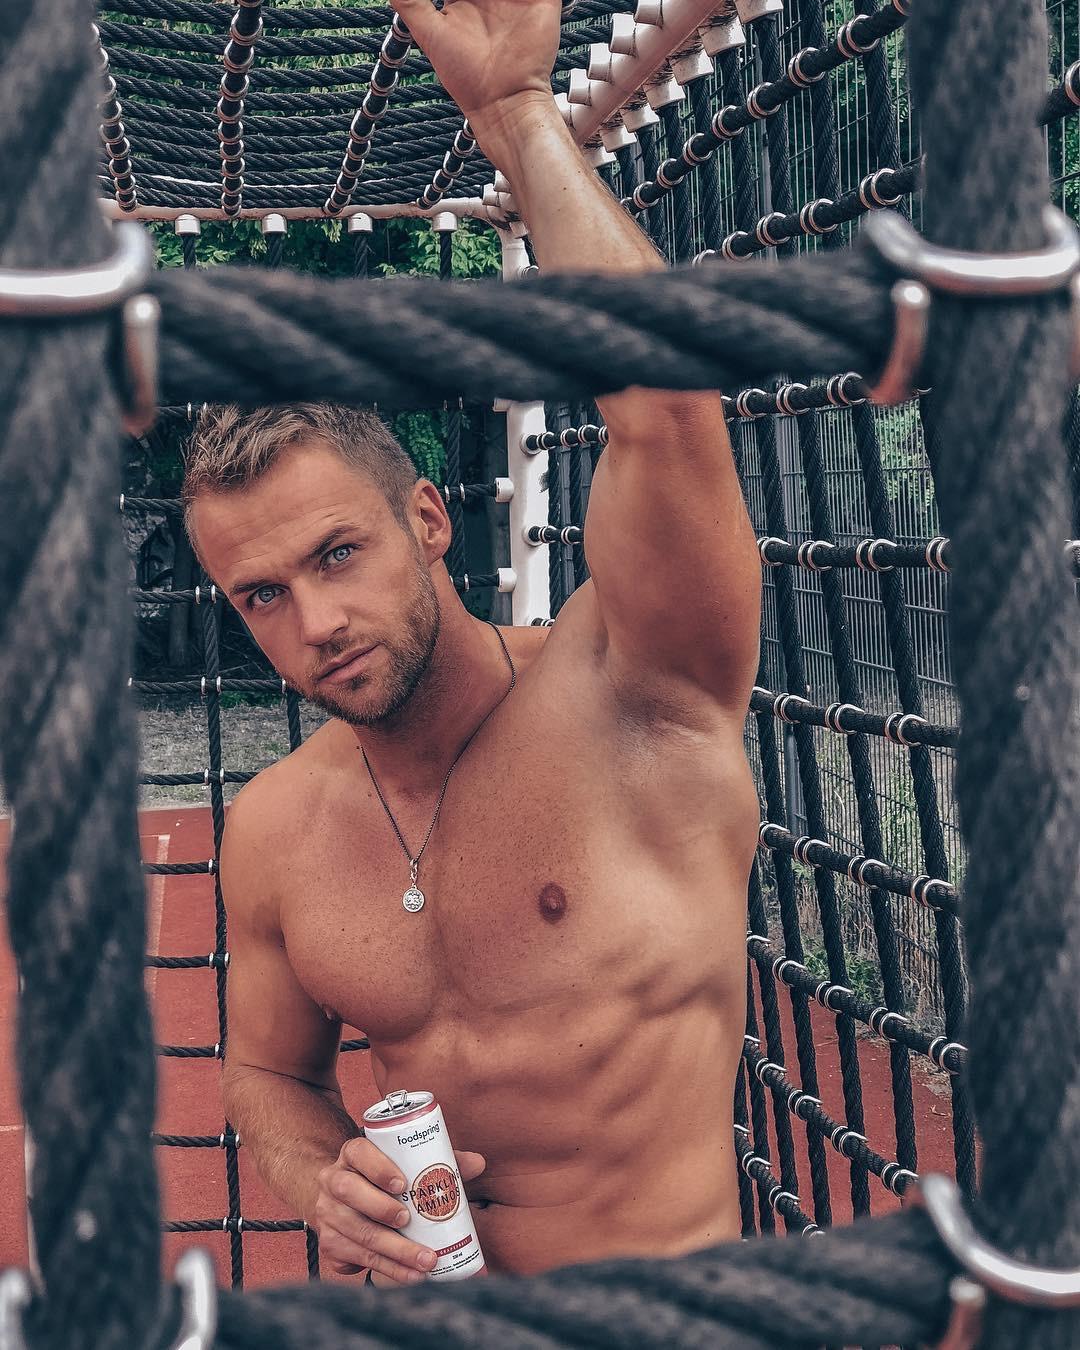 2018081406305756 - 美国Instagram模特型男:Philipp Stehler